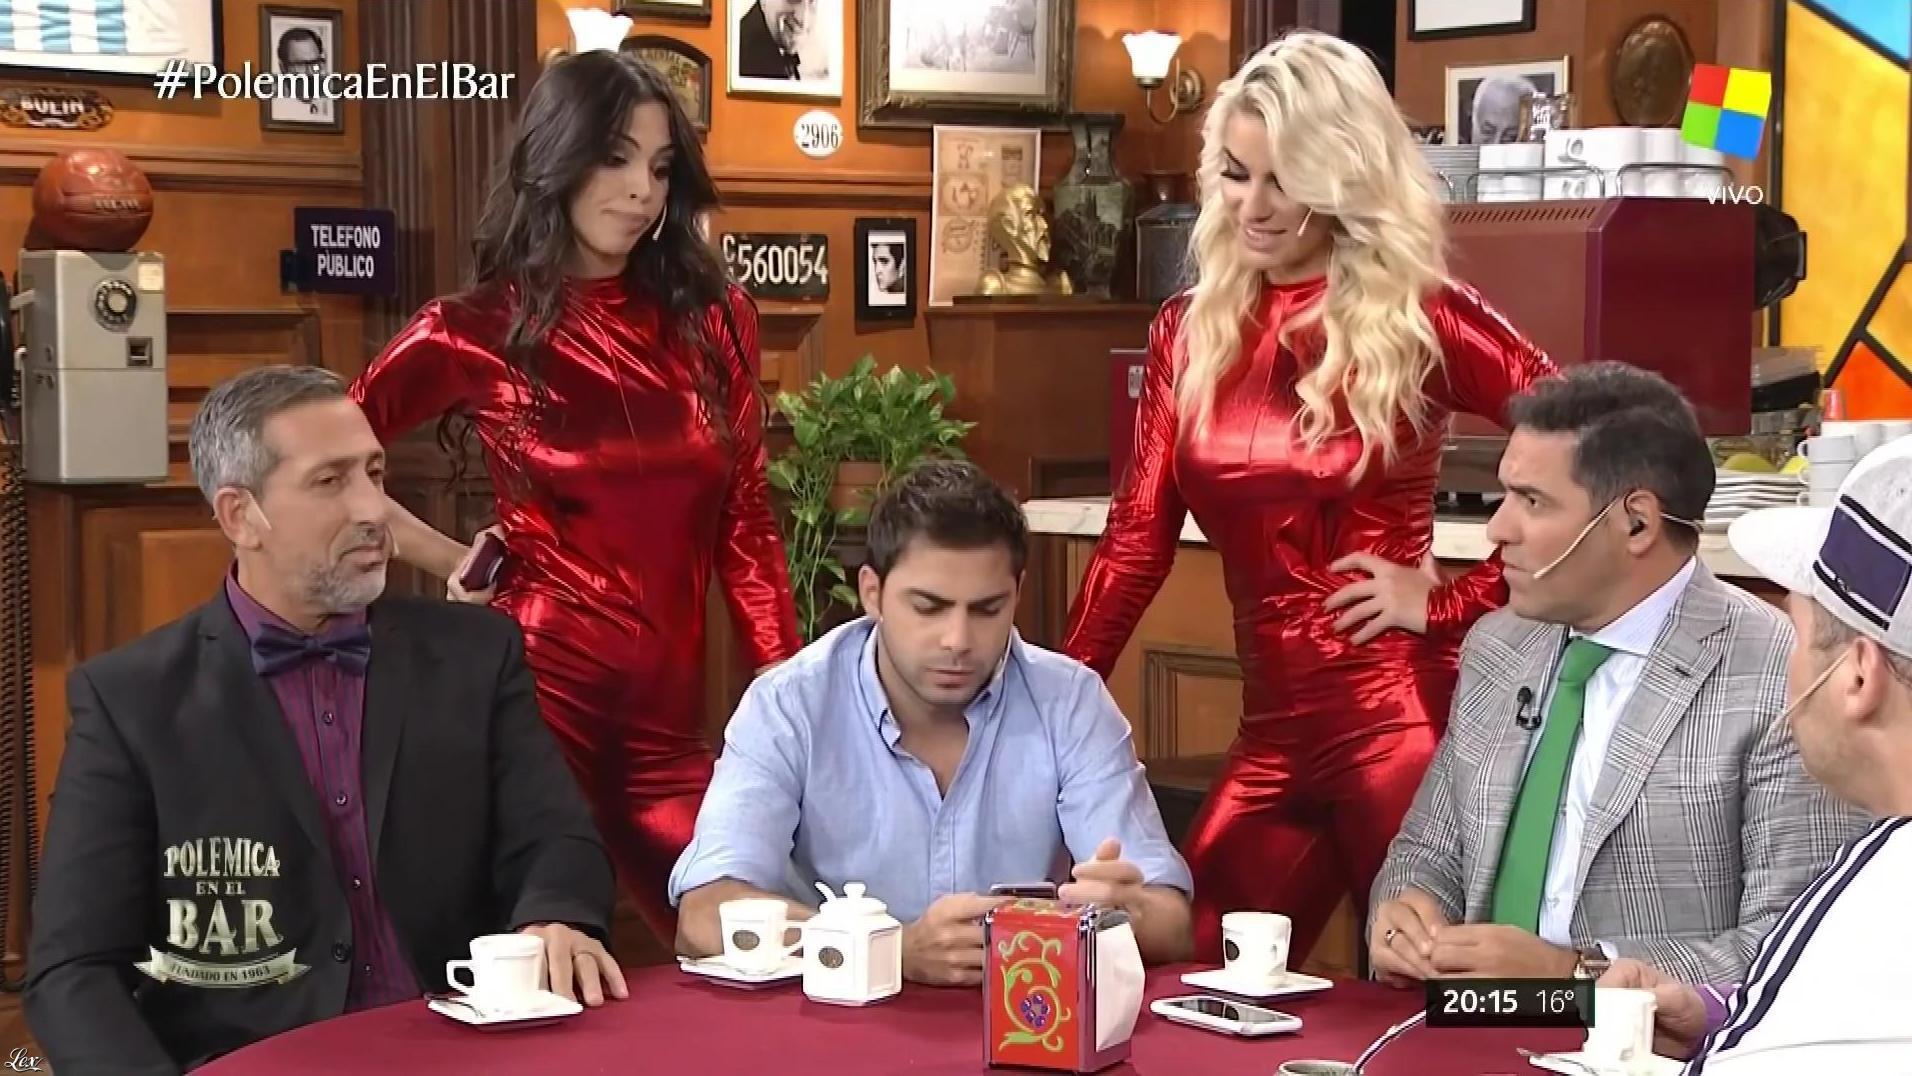 Ailen Bechara et Maypi Delgado dans PolemiÇa en El Bar. Diffusé à la télévision le 17/05/17.